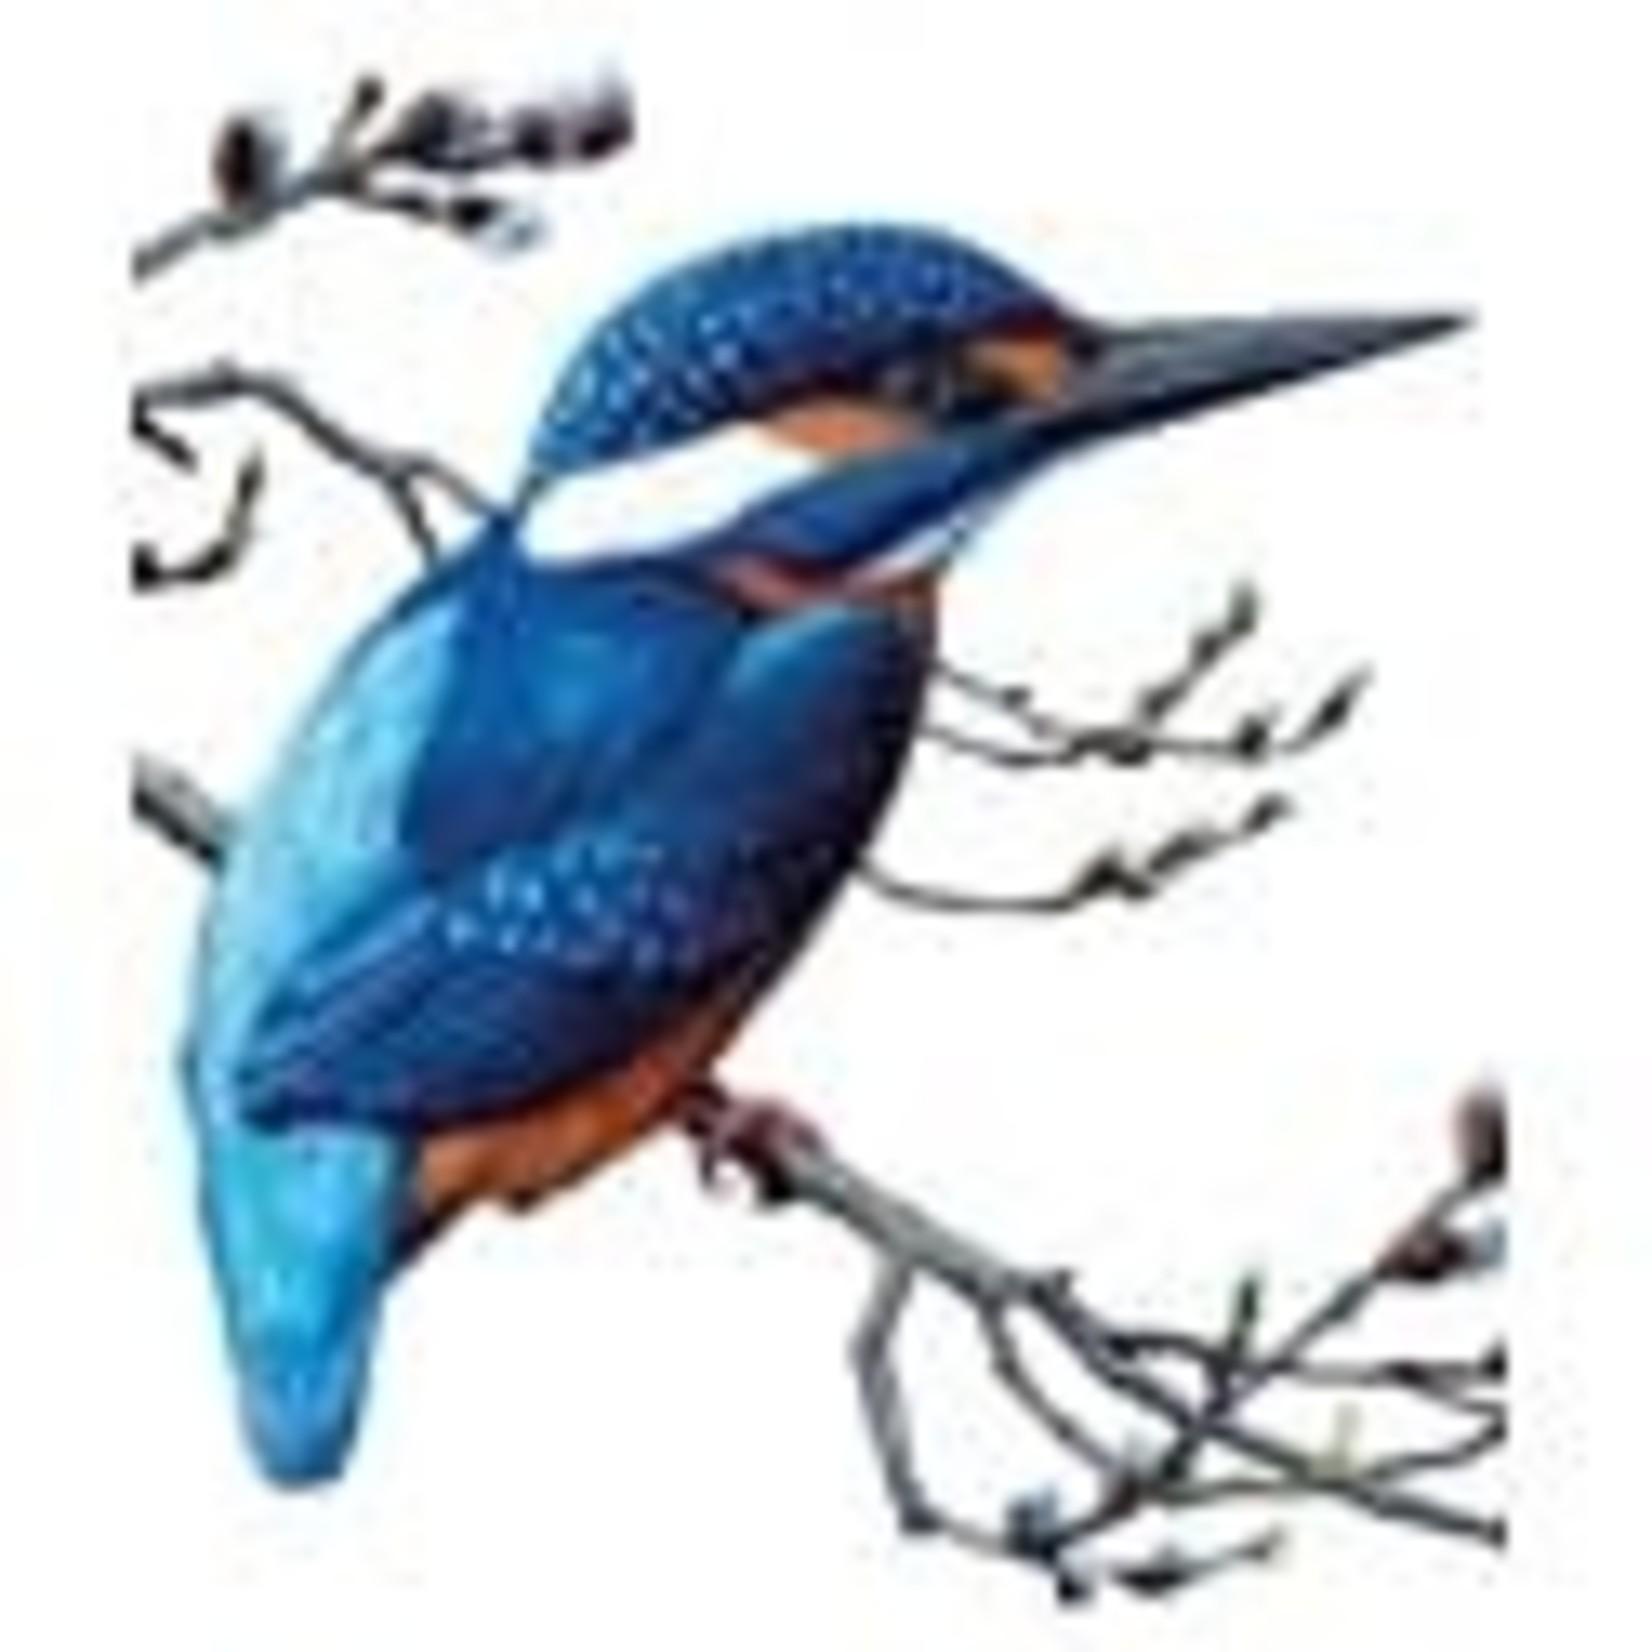 Archivist Kingfisher